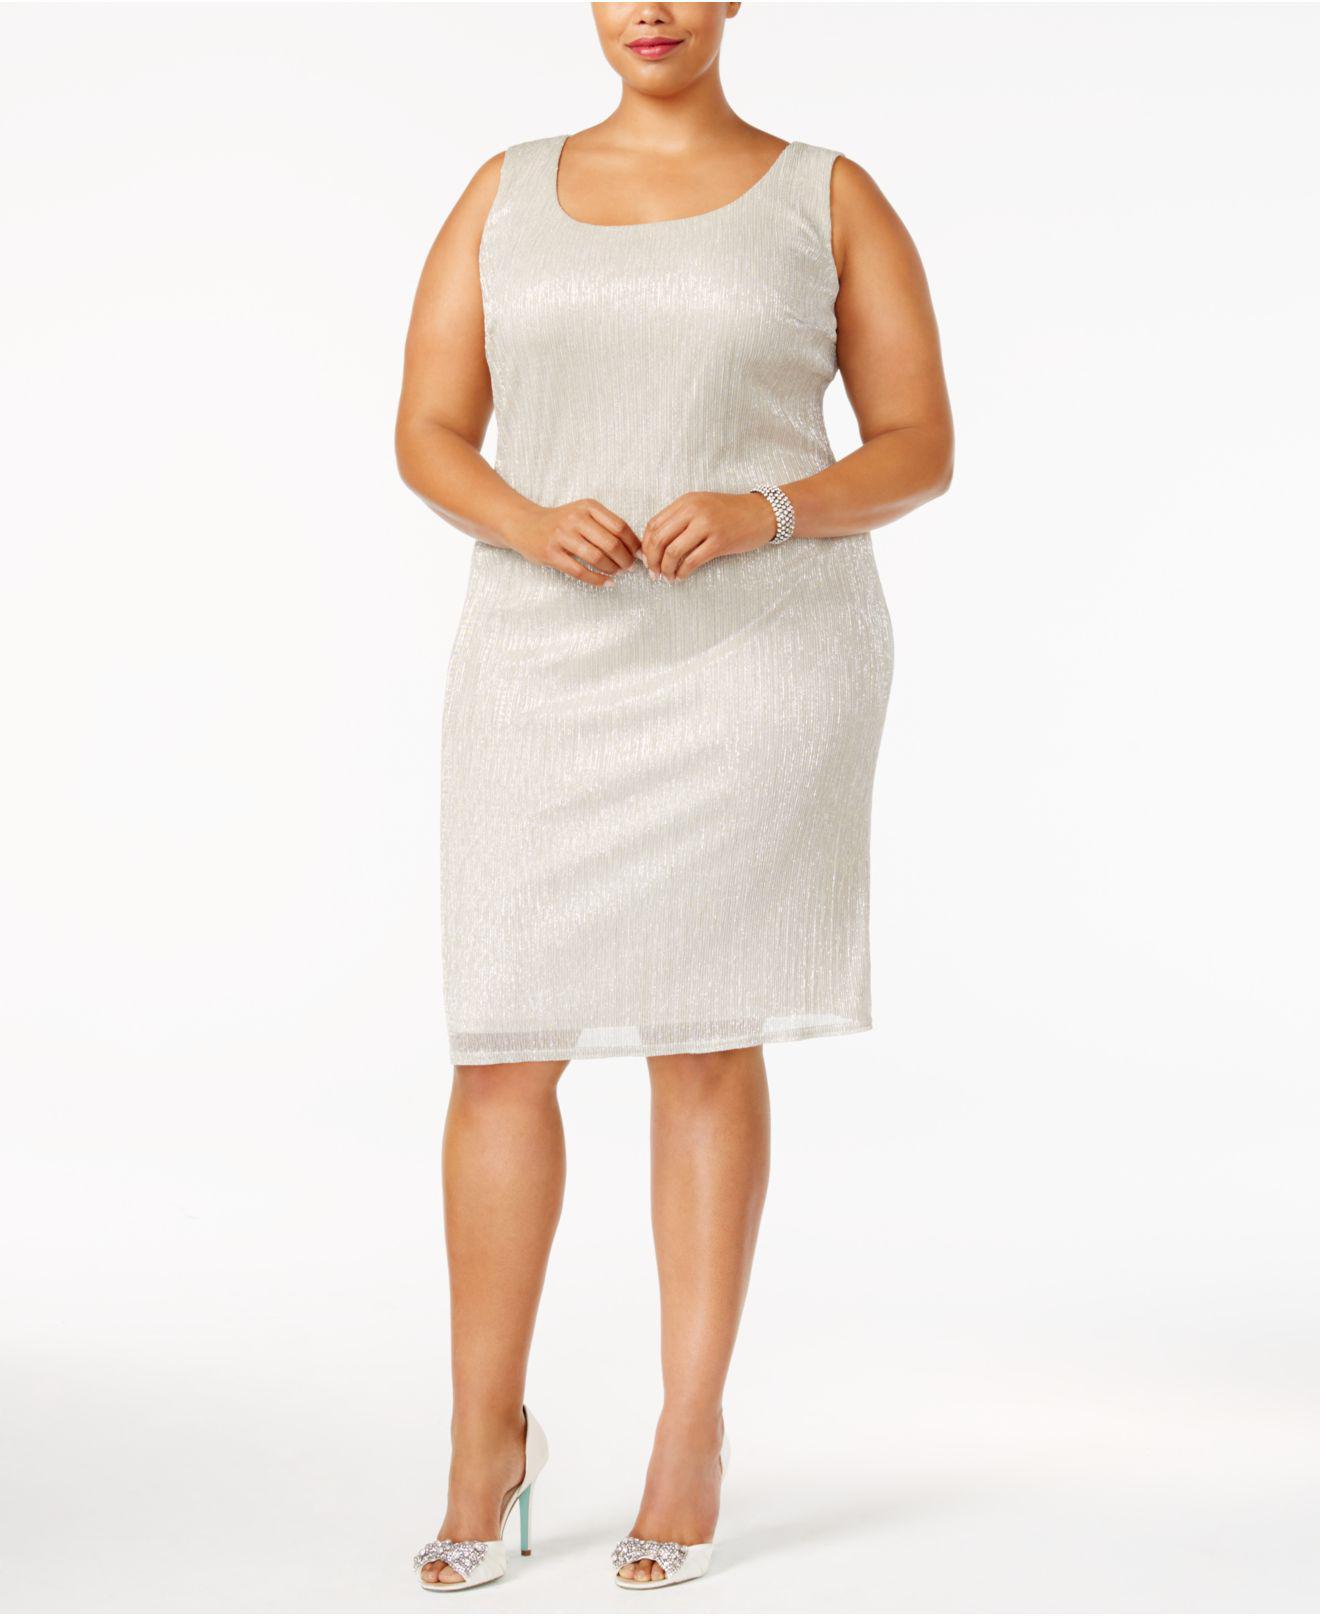 43ecb65d2974f Lyst - R   M Richards R m Richards Plus Size Sleeveless Metallic Dress And  Jacket